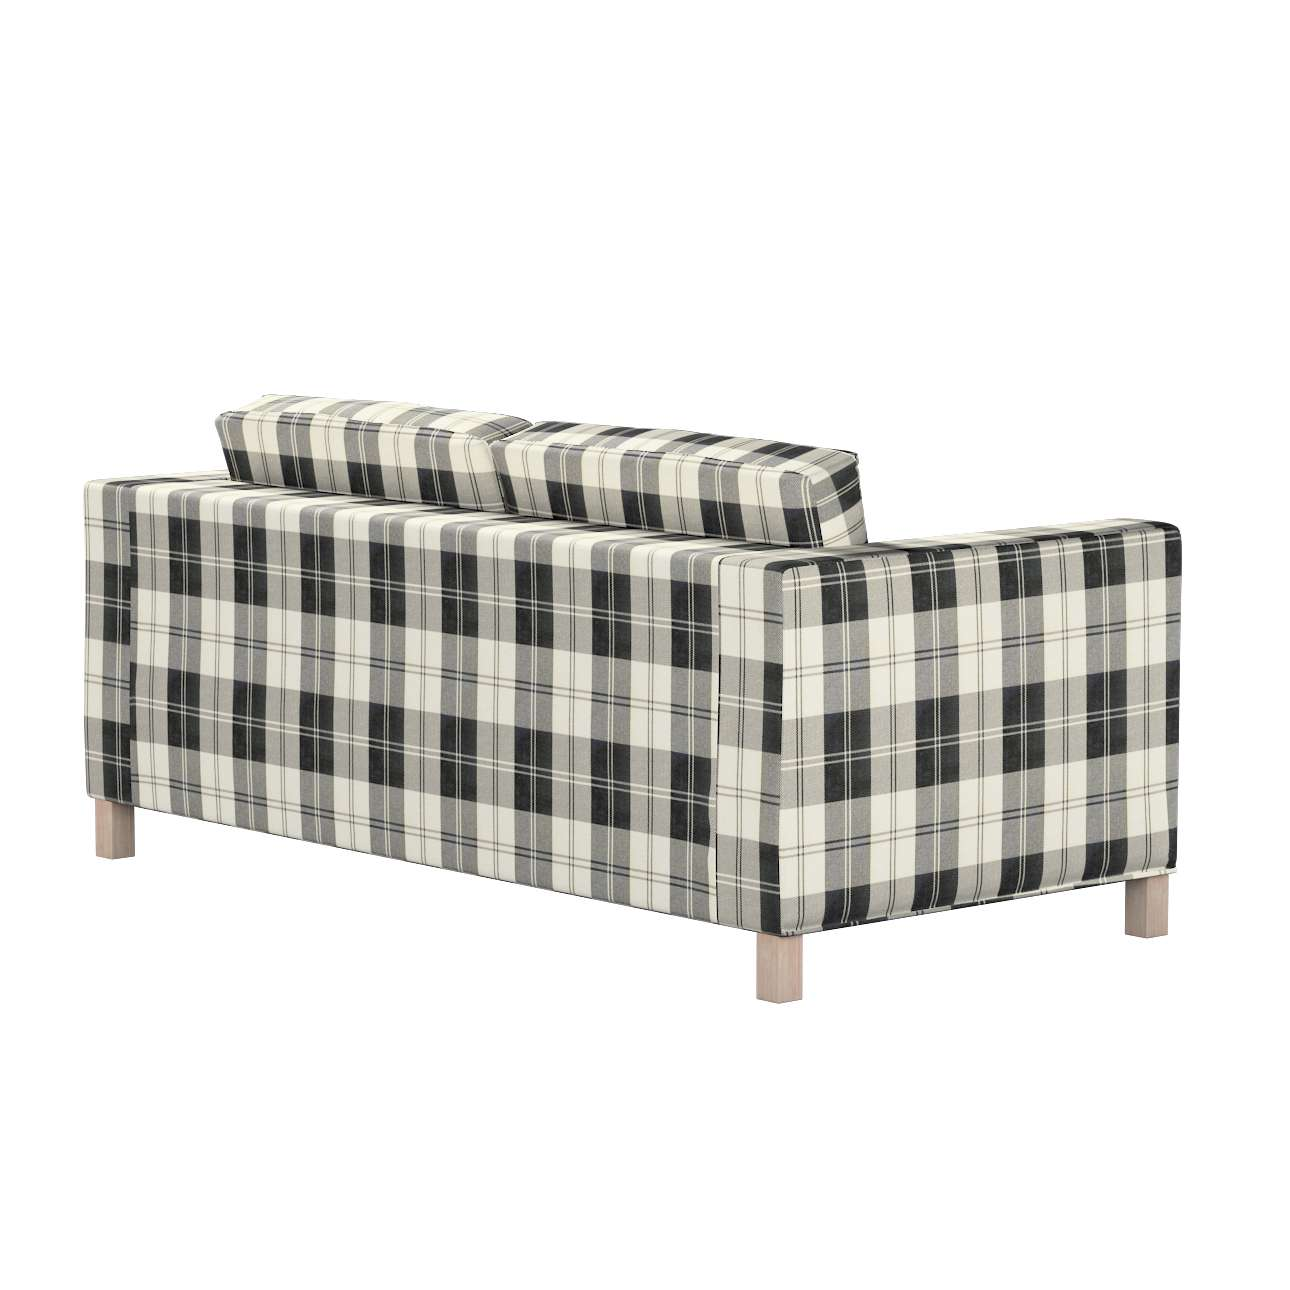 Potah na pohovku IKEA  Karlanda rozkládací, krátký v kolekci Edinburgh, látka: 115-74